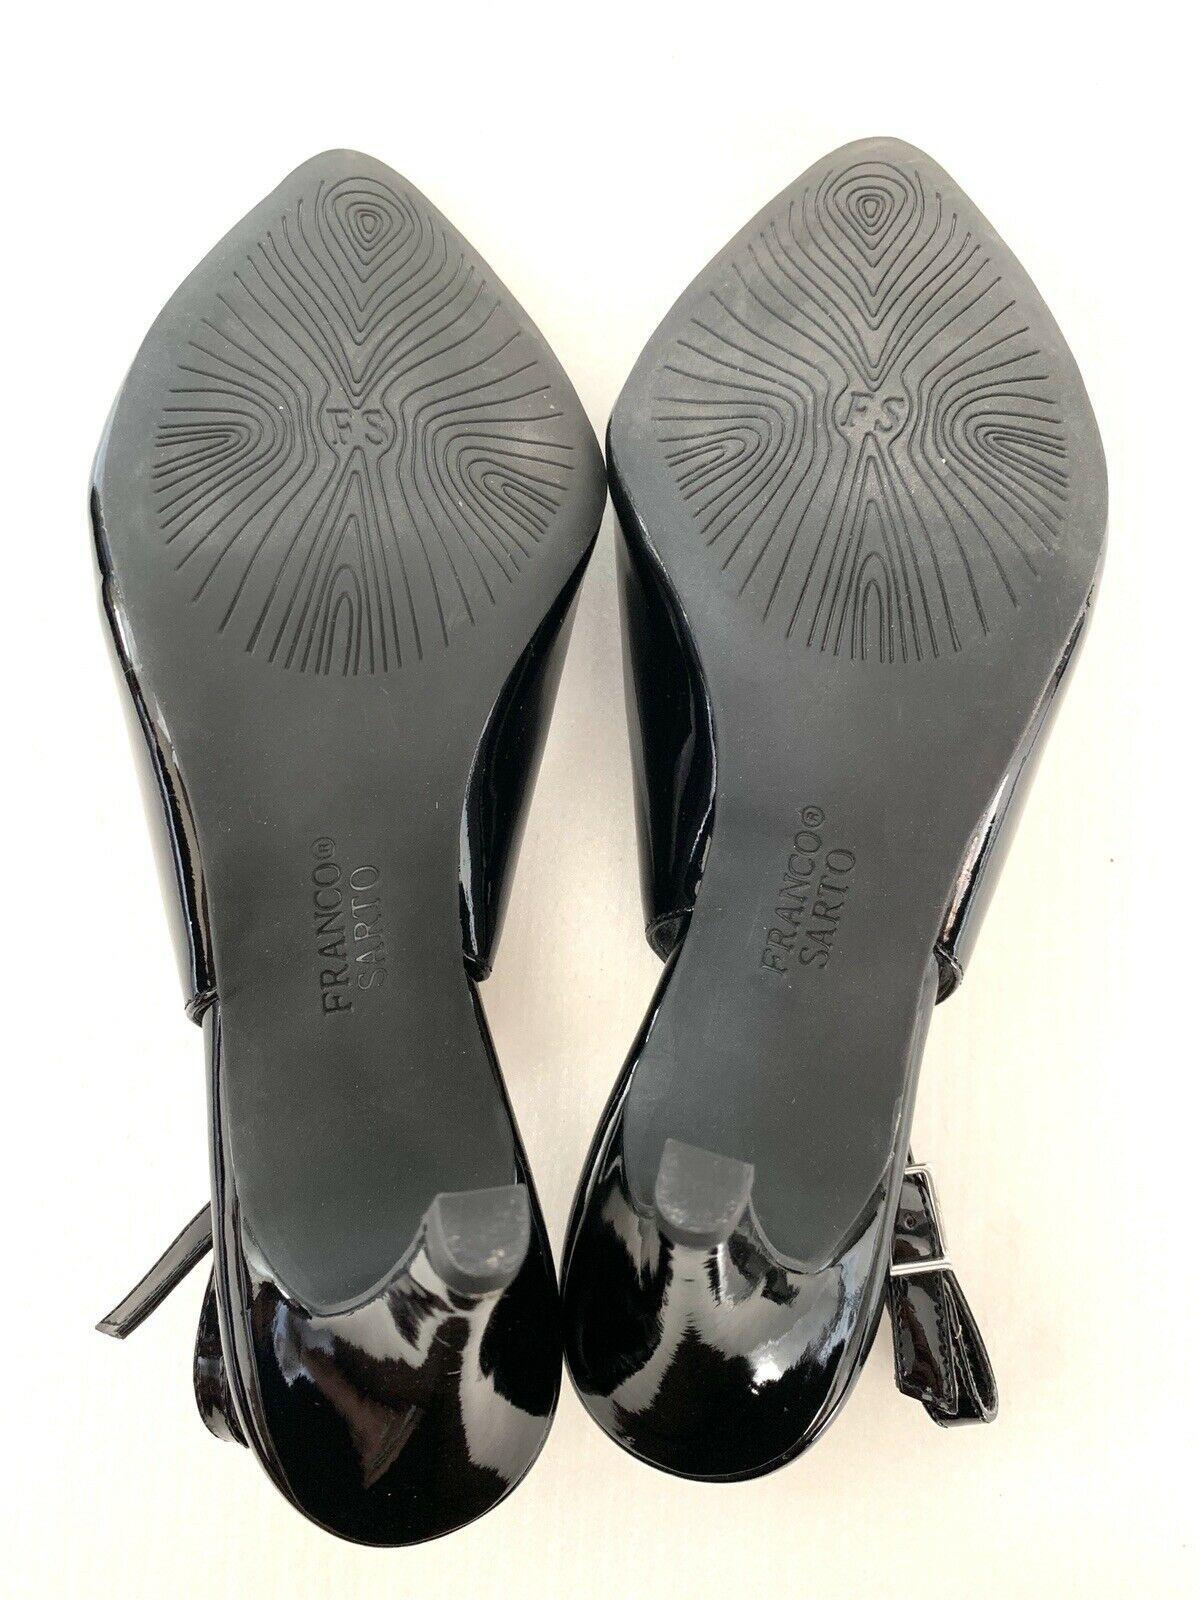 FRANCO SARTO Harla Black Patent Leather Slingback Pumps Heels SZ 8.5M image 7